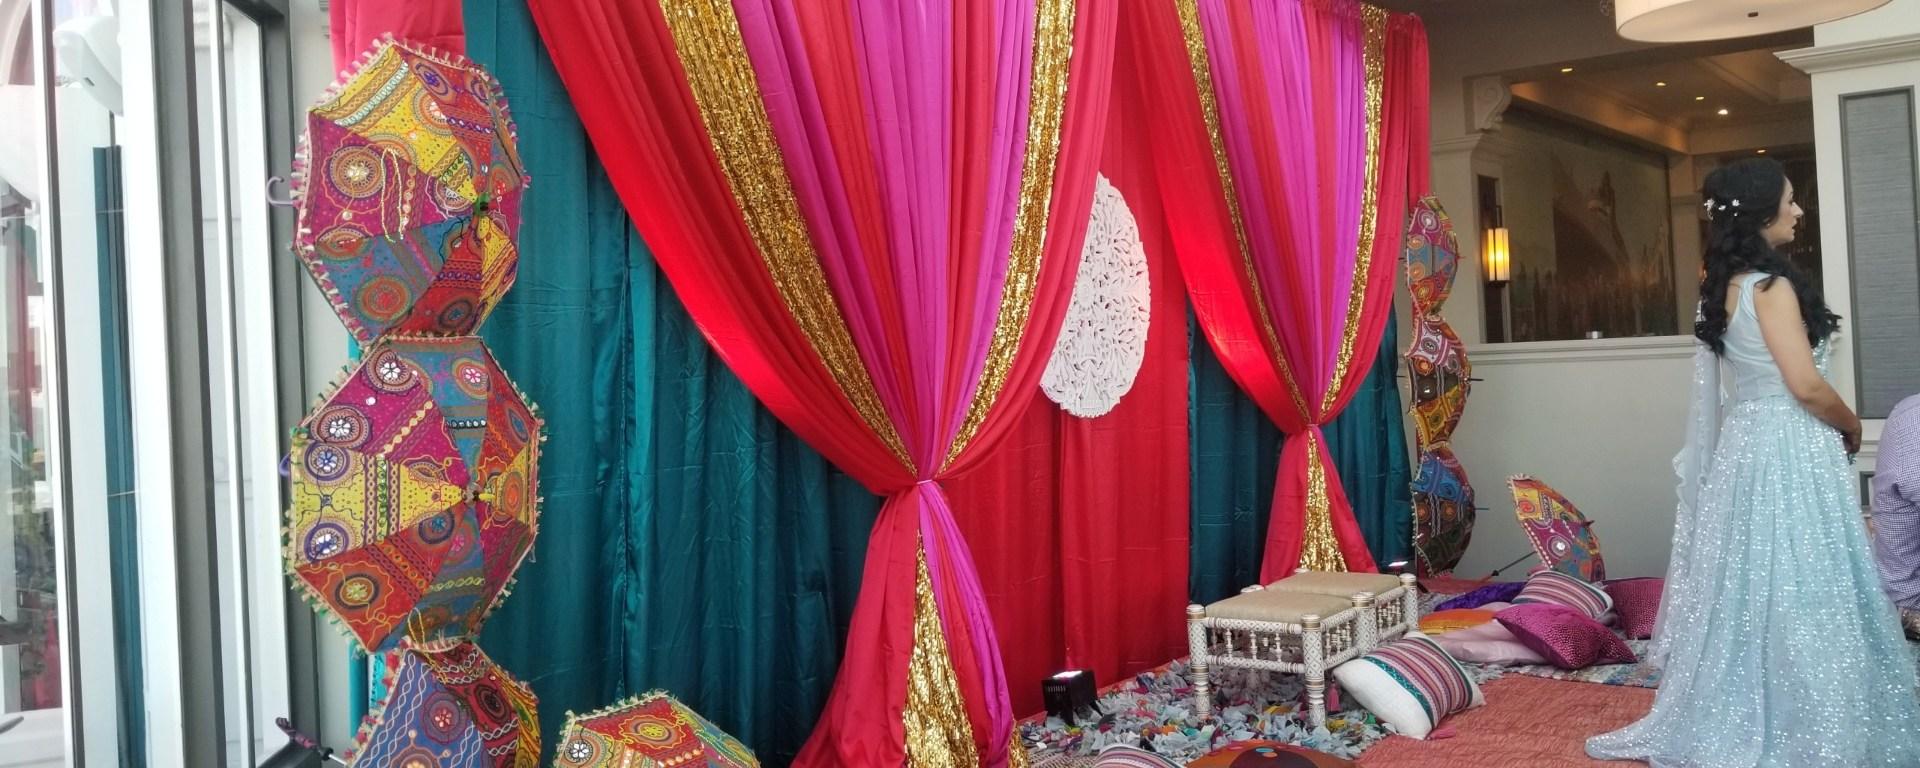 Indian Wedding Vendors Florida And Georgia Indian Wedding Venues